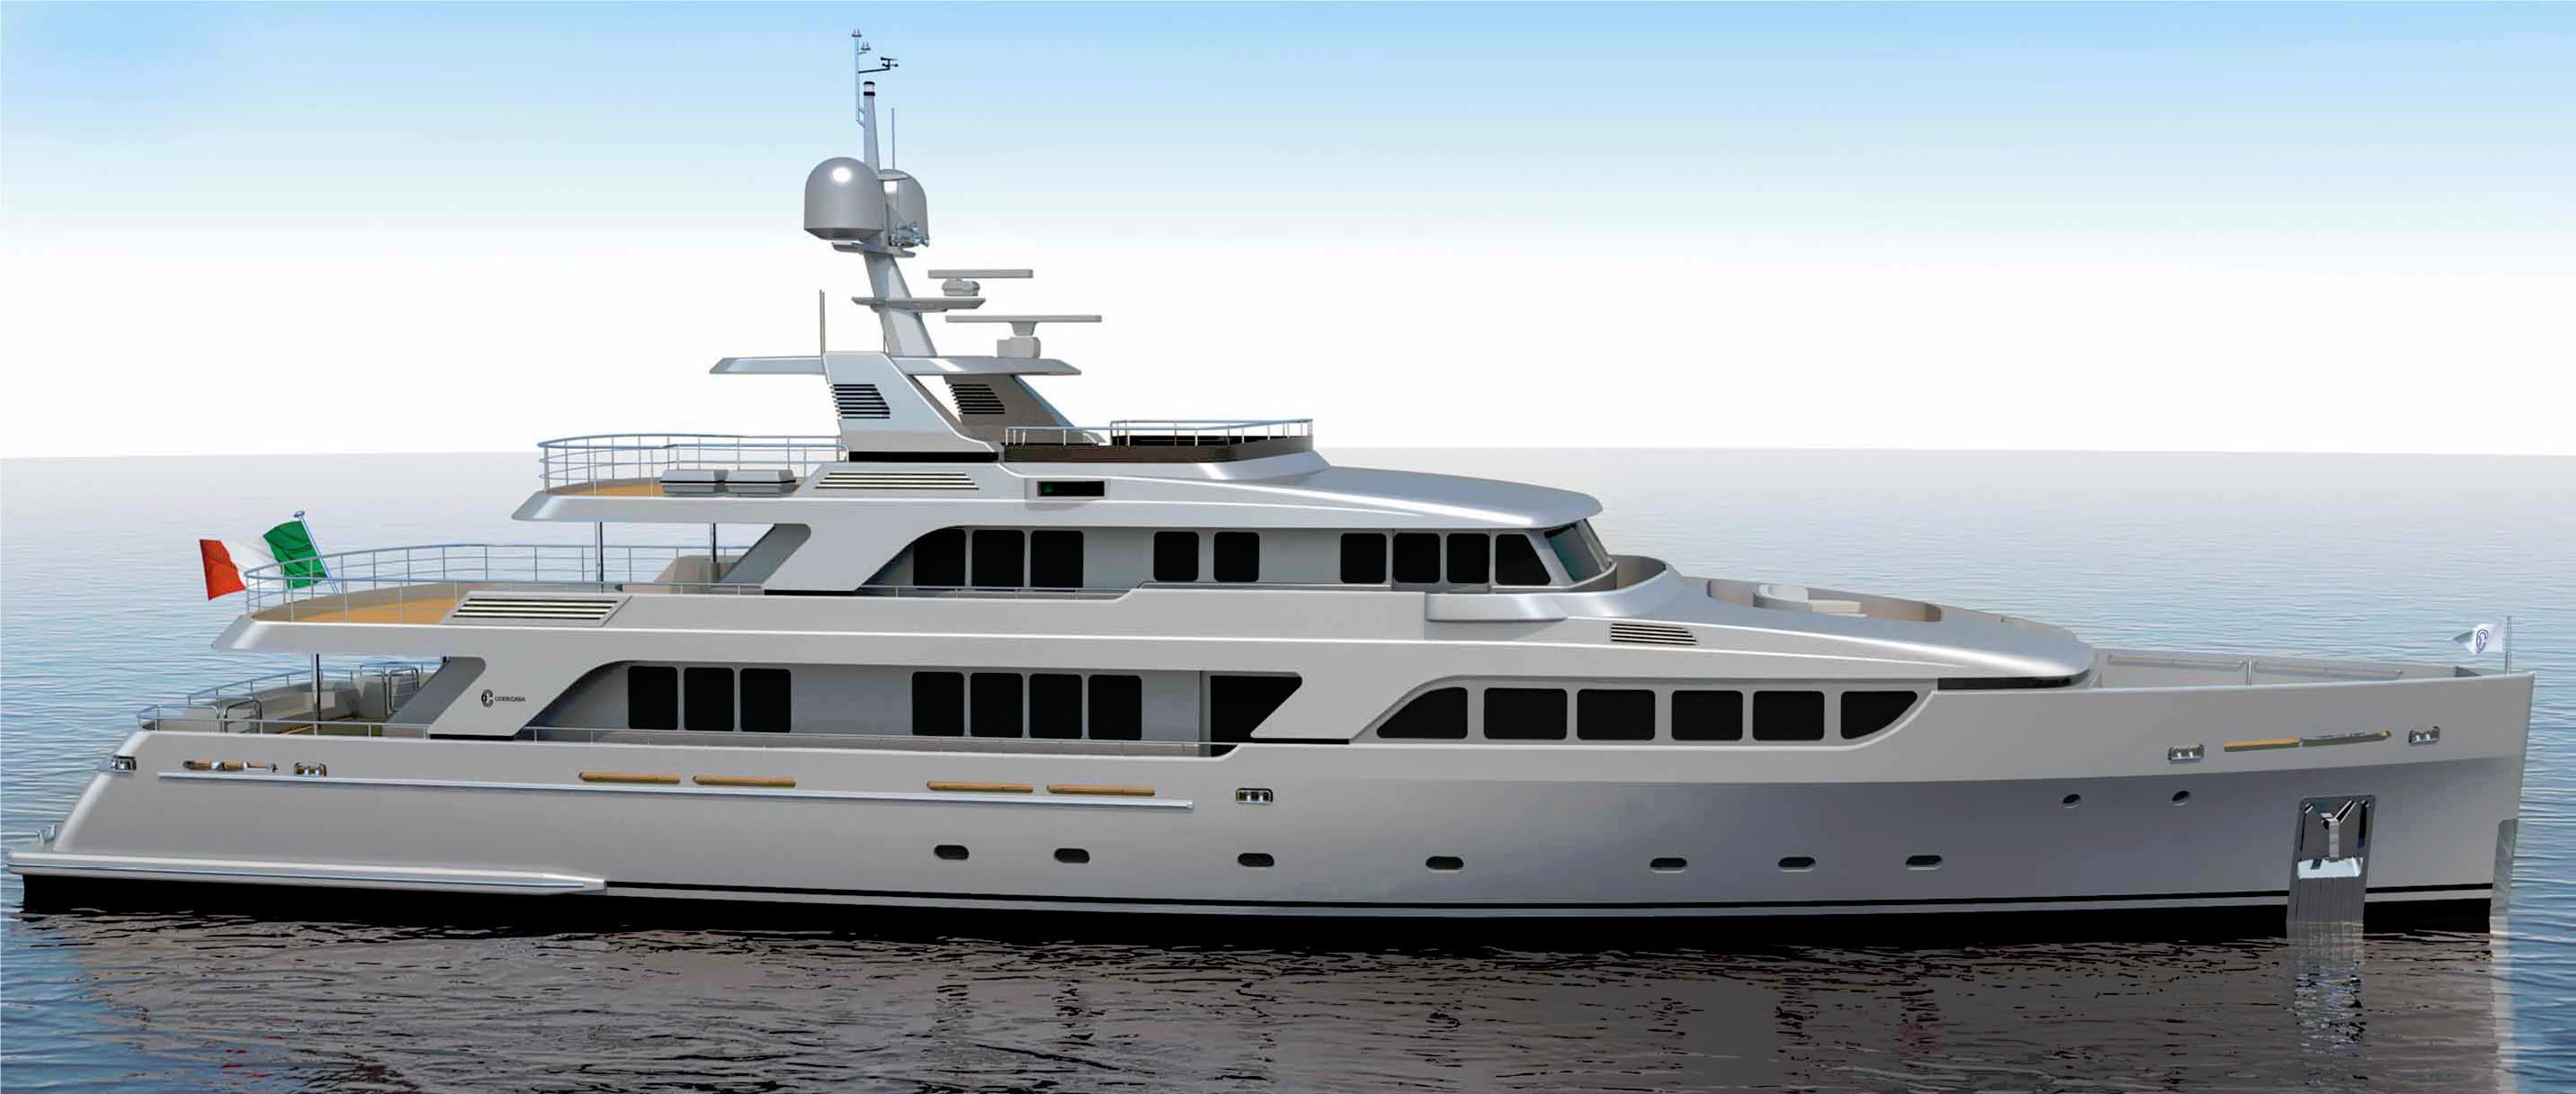 medium resolution of 2017 codecasa vintage series full beam power boat for sale www yachtworld com